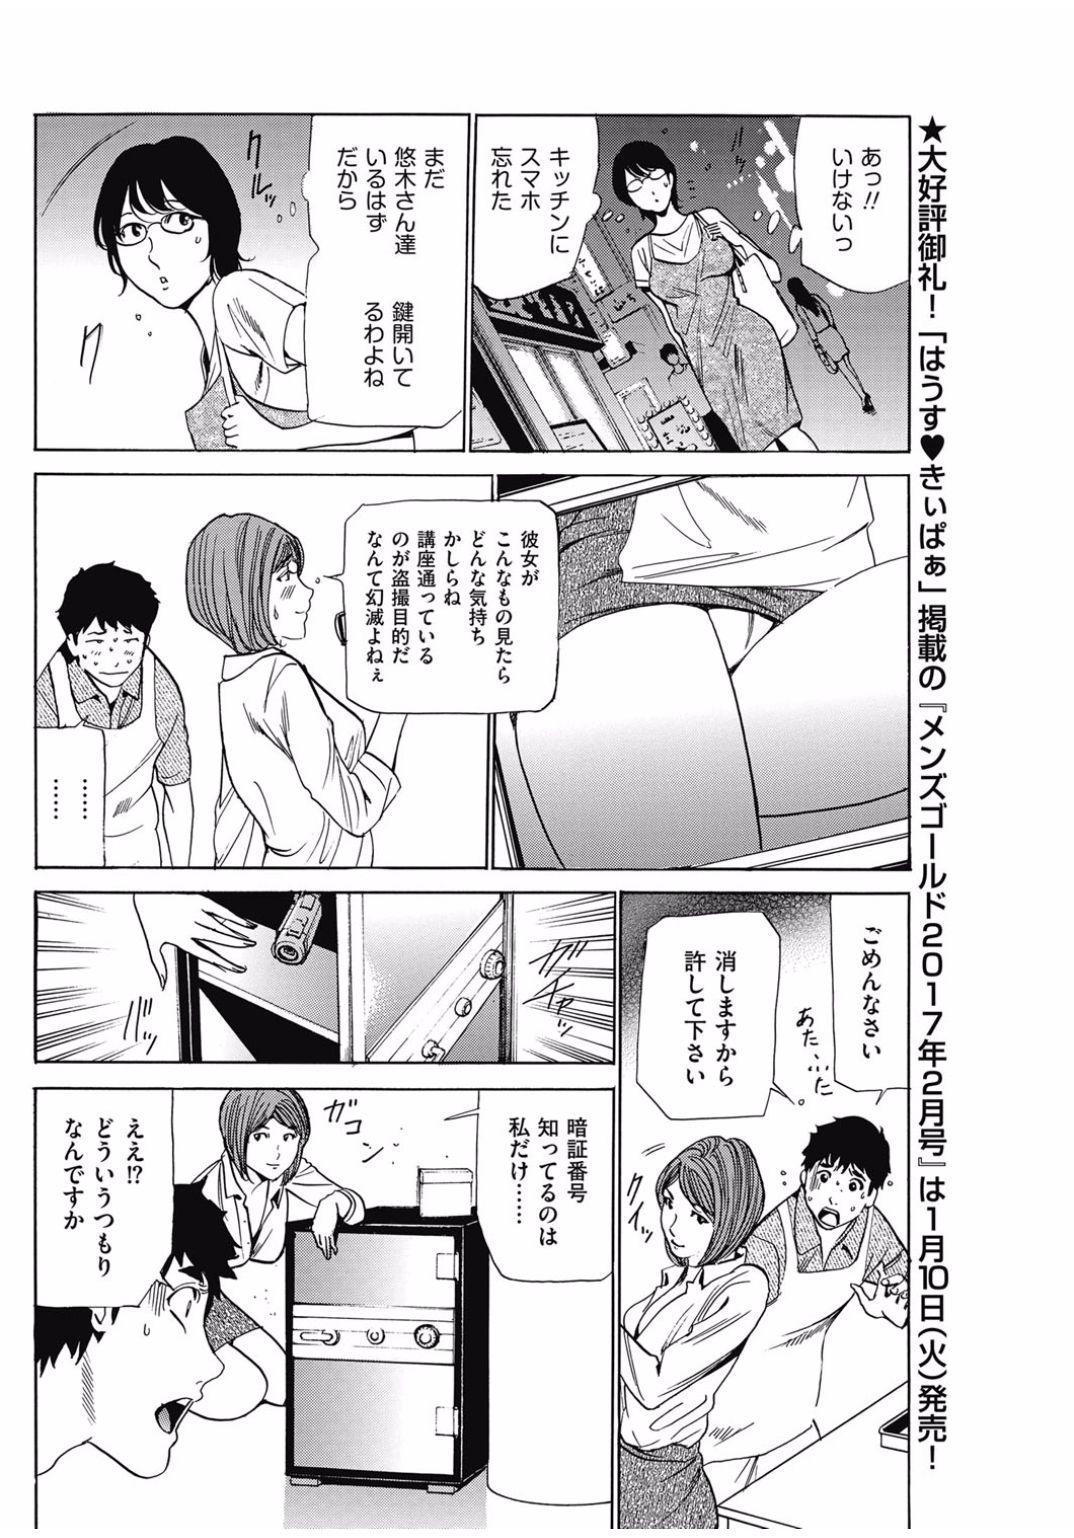 Wa Usuki Ipa a 1-10 80